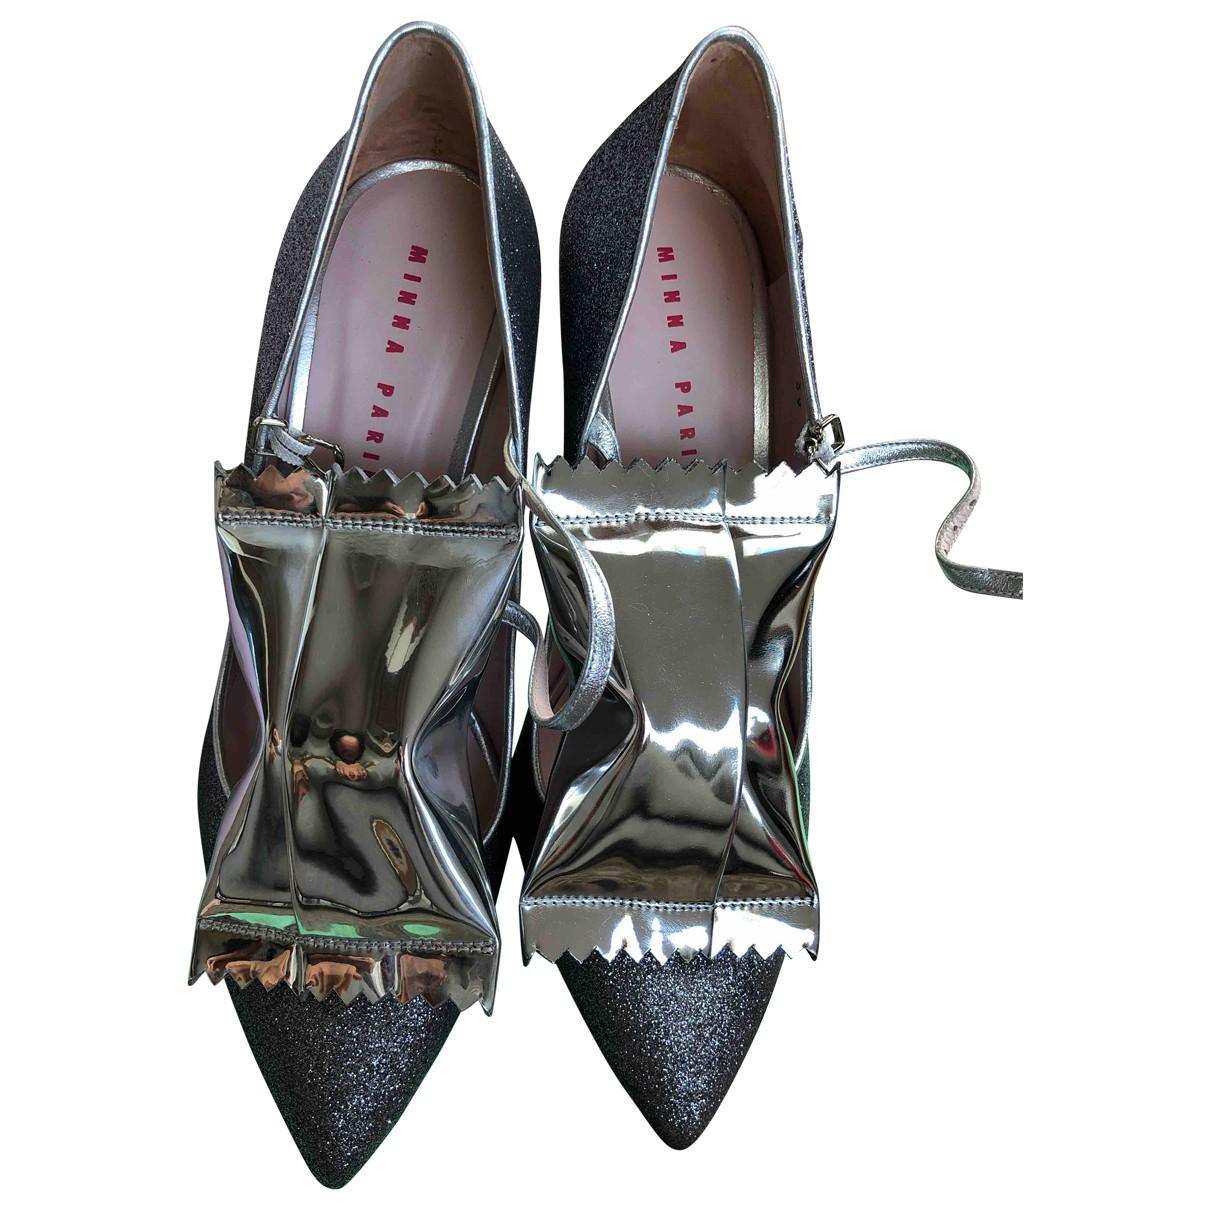 Minna Parikka \N Silver Leather Heels for Women 39 EU